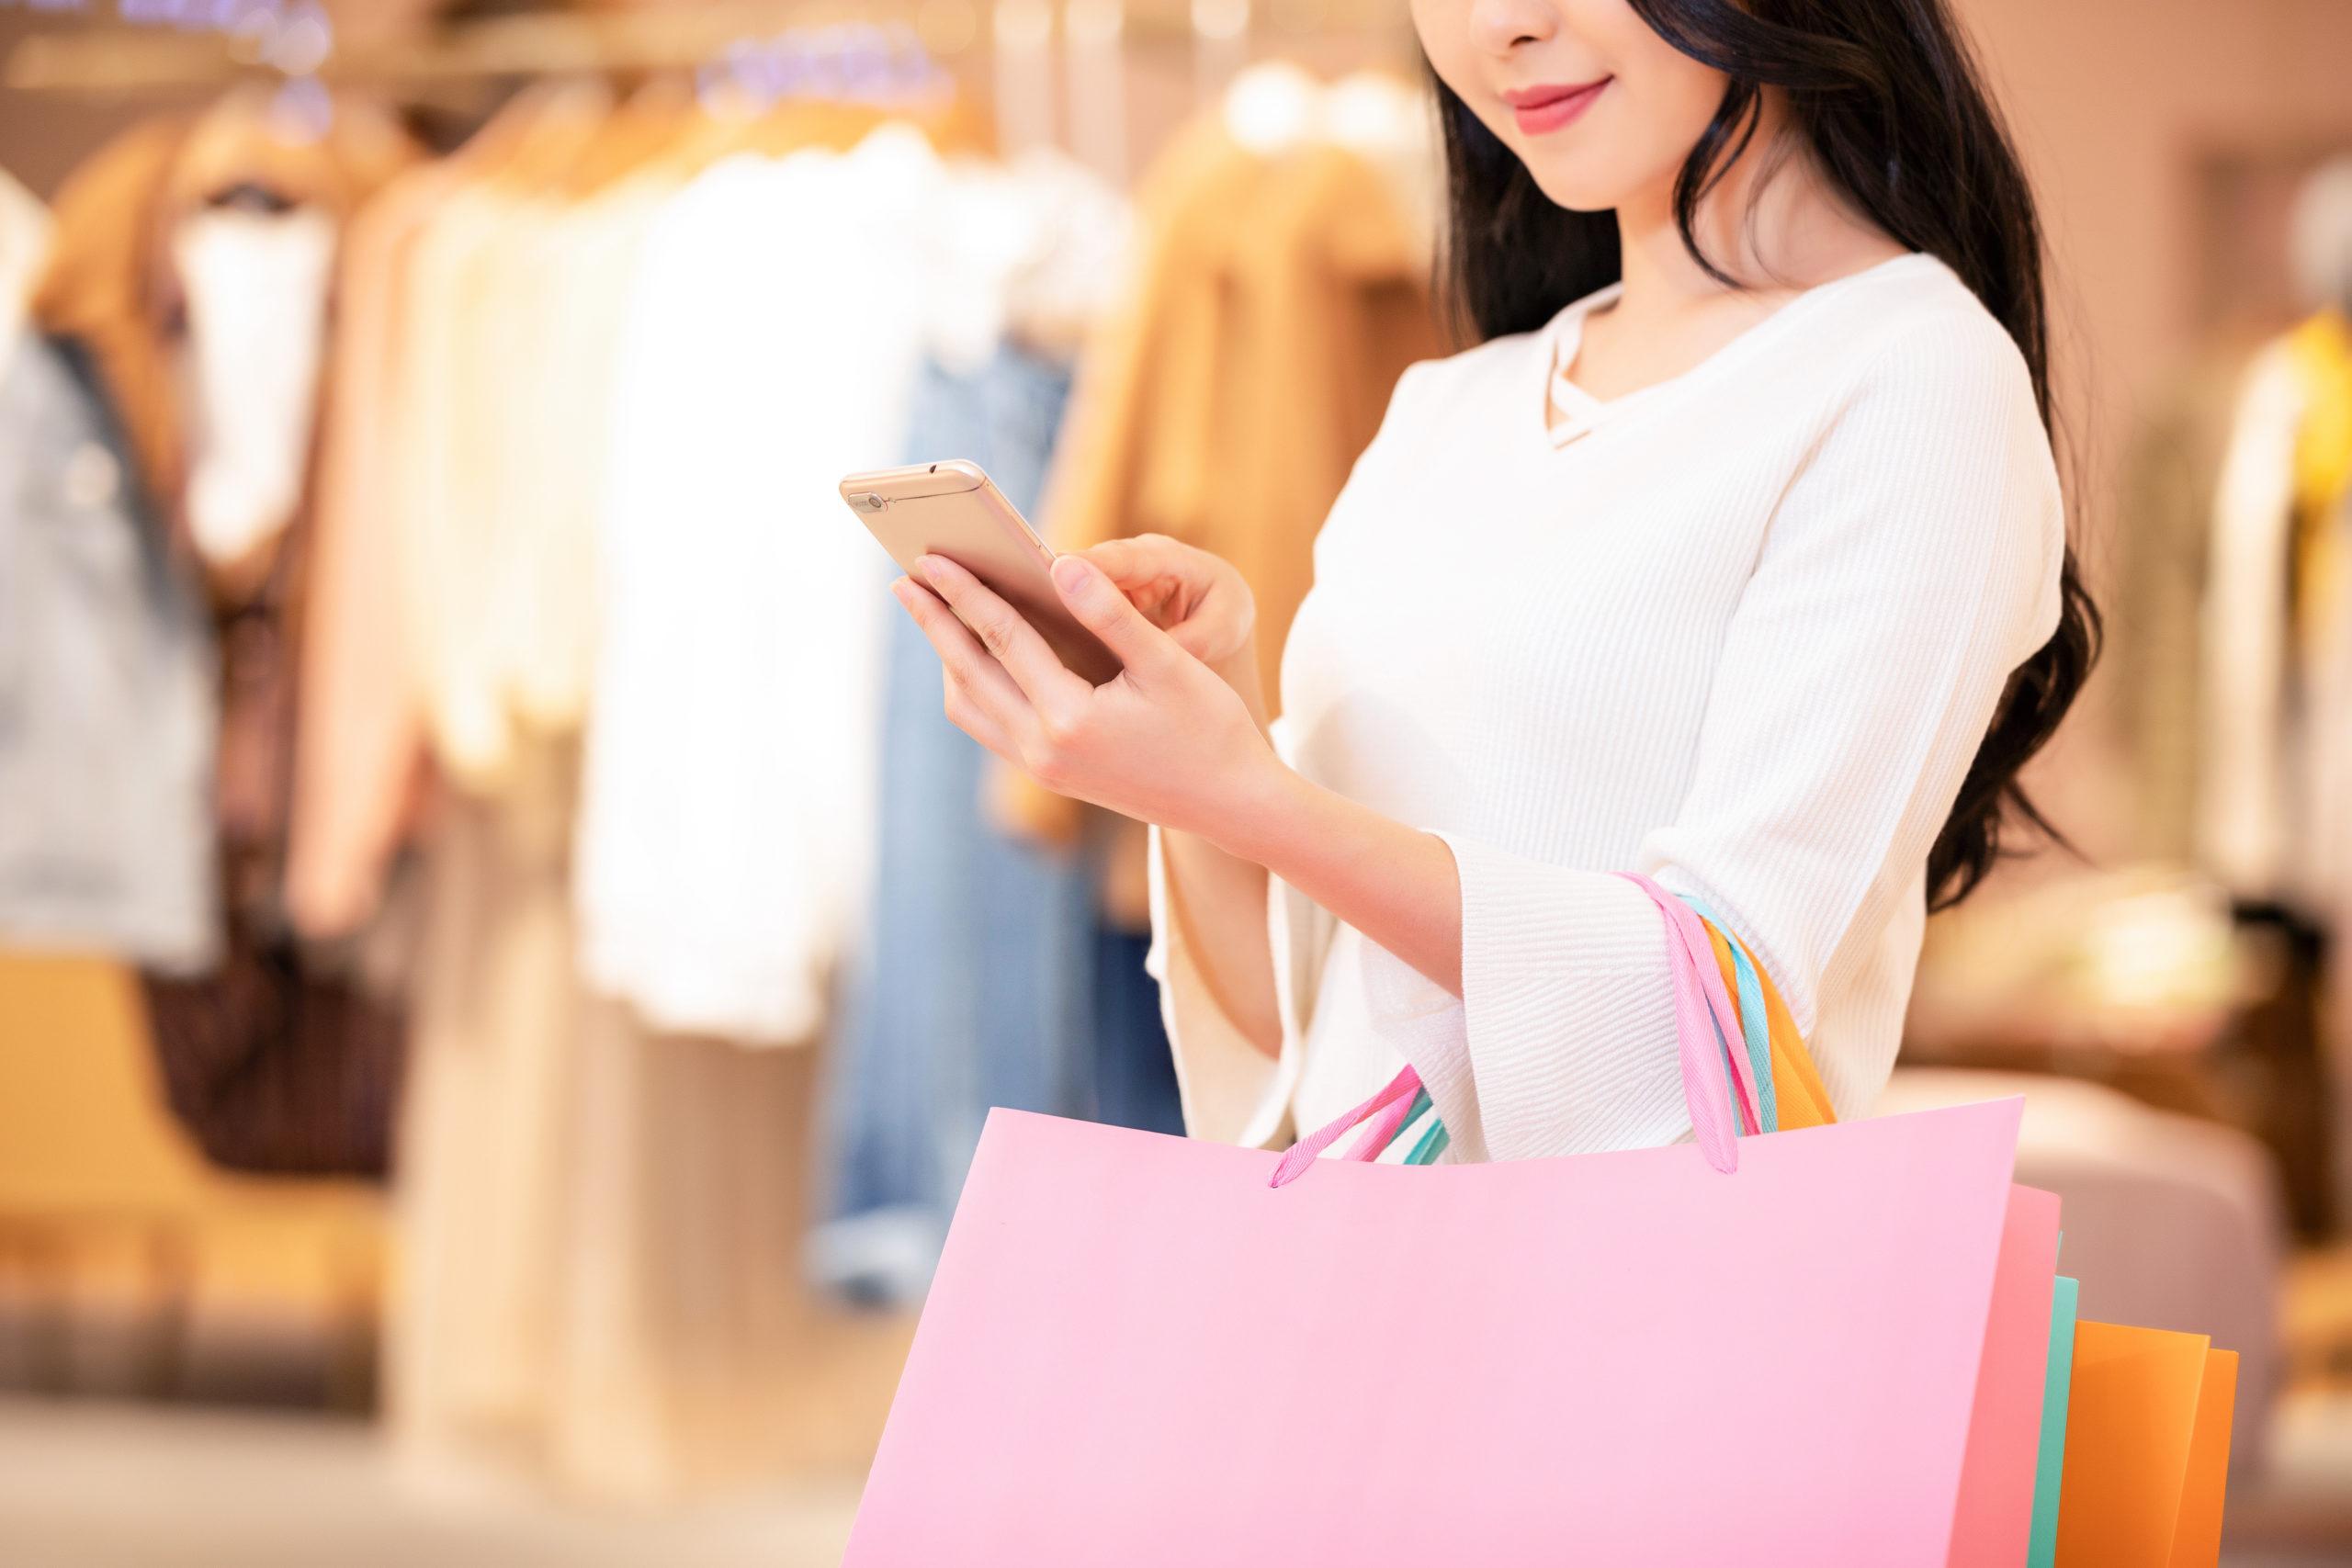 Il social commerce Xiaohongshu: un boost per vendite e visibilità